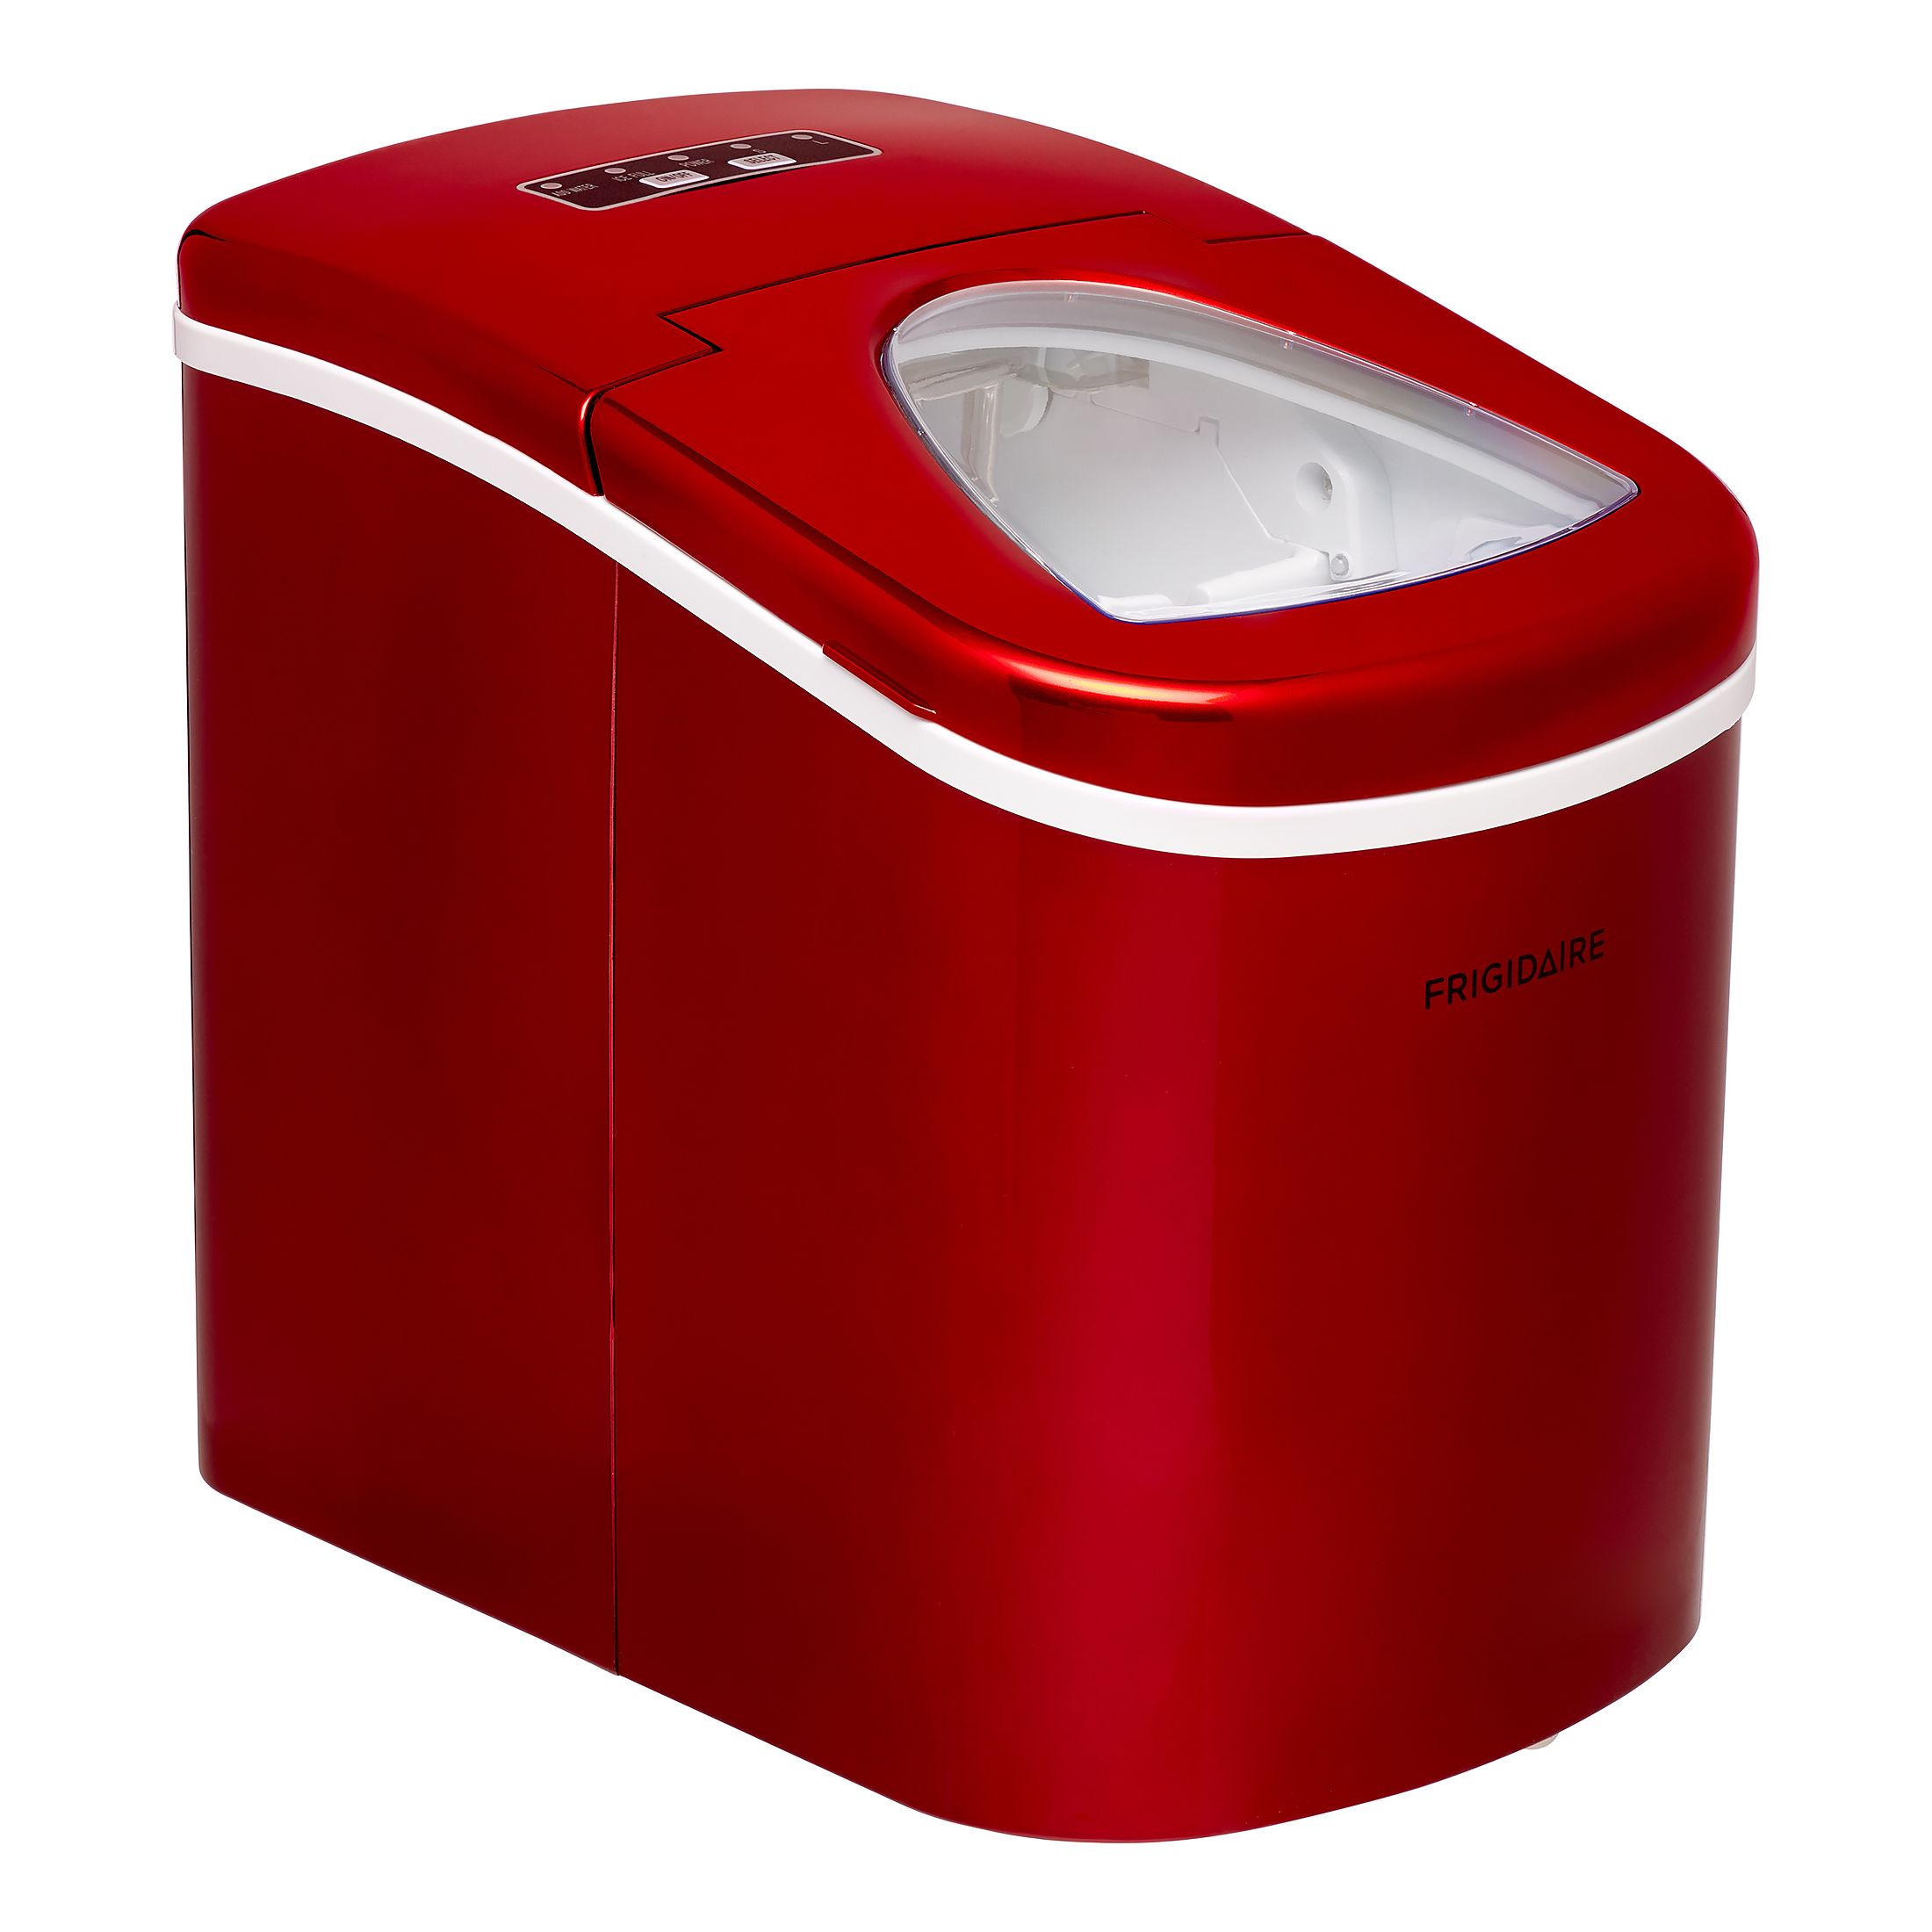 Frigidaire Portable Countertop Icemaker